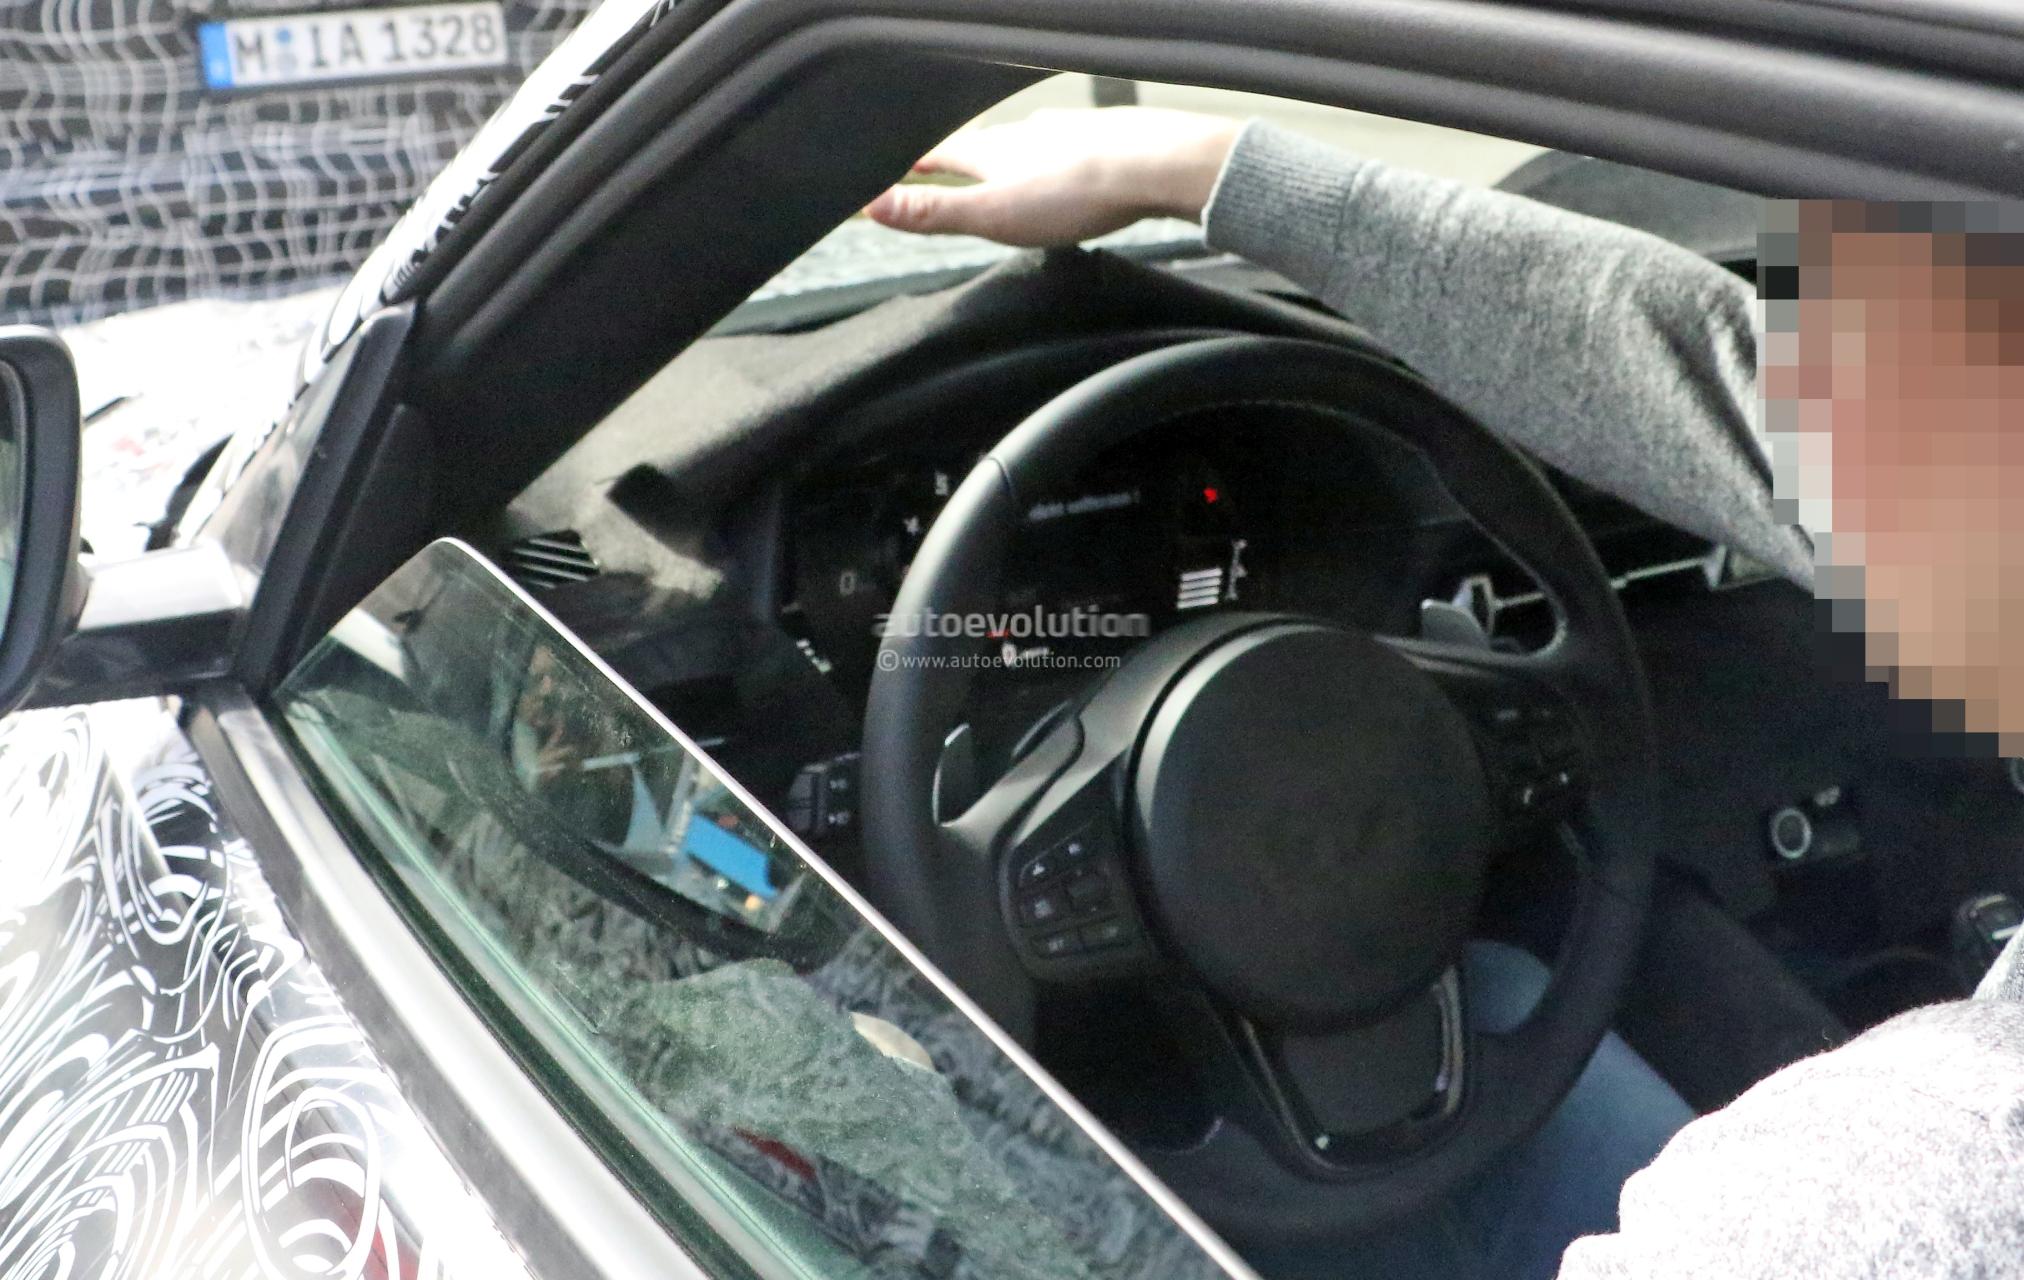 Spyshots 2019 Toyota Supra Interior Shown By Prototype